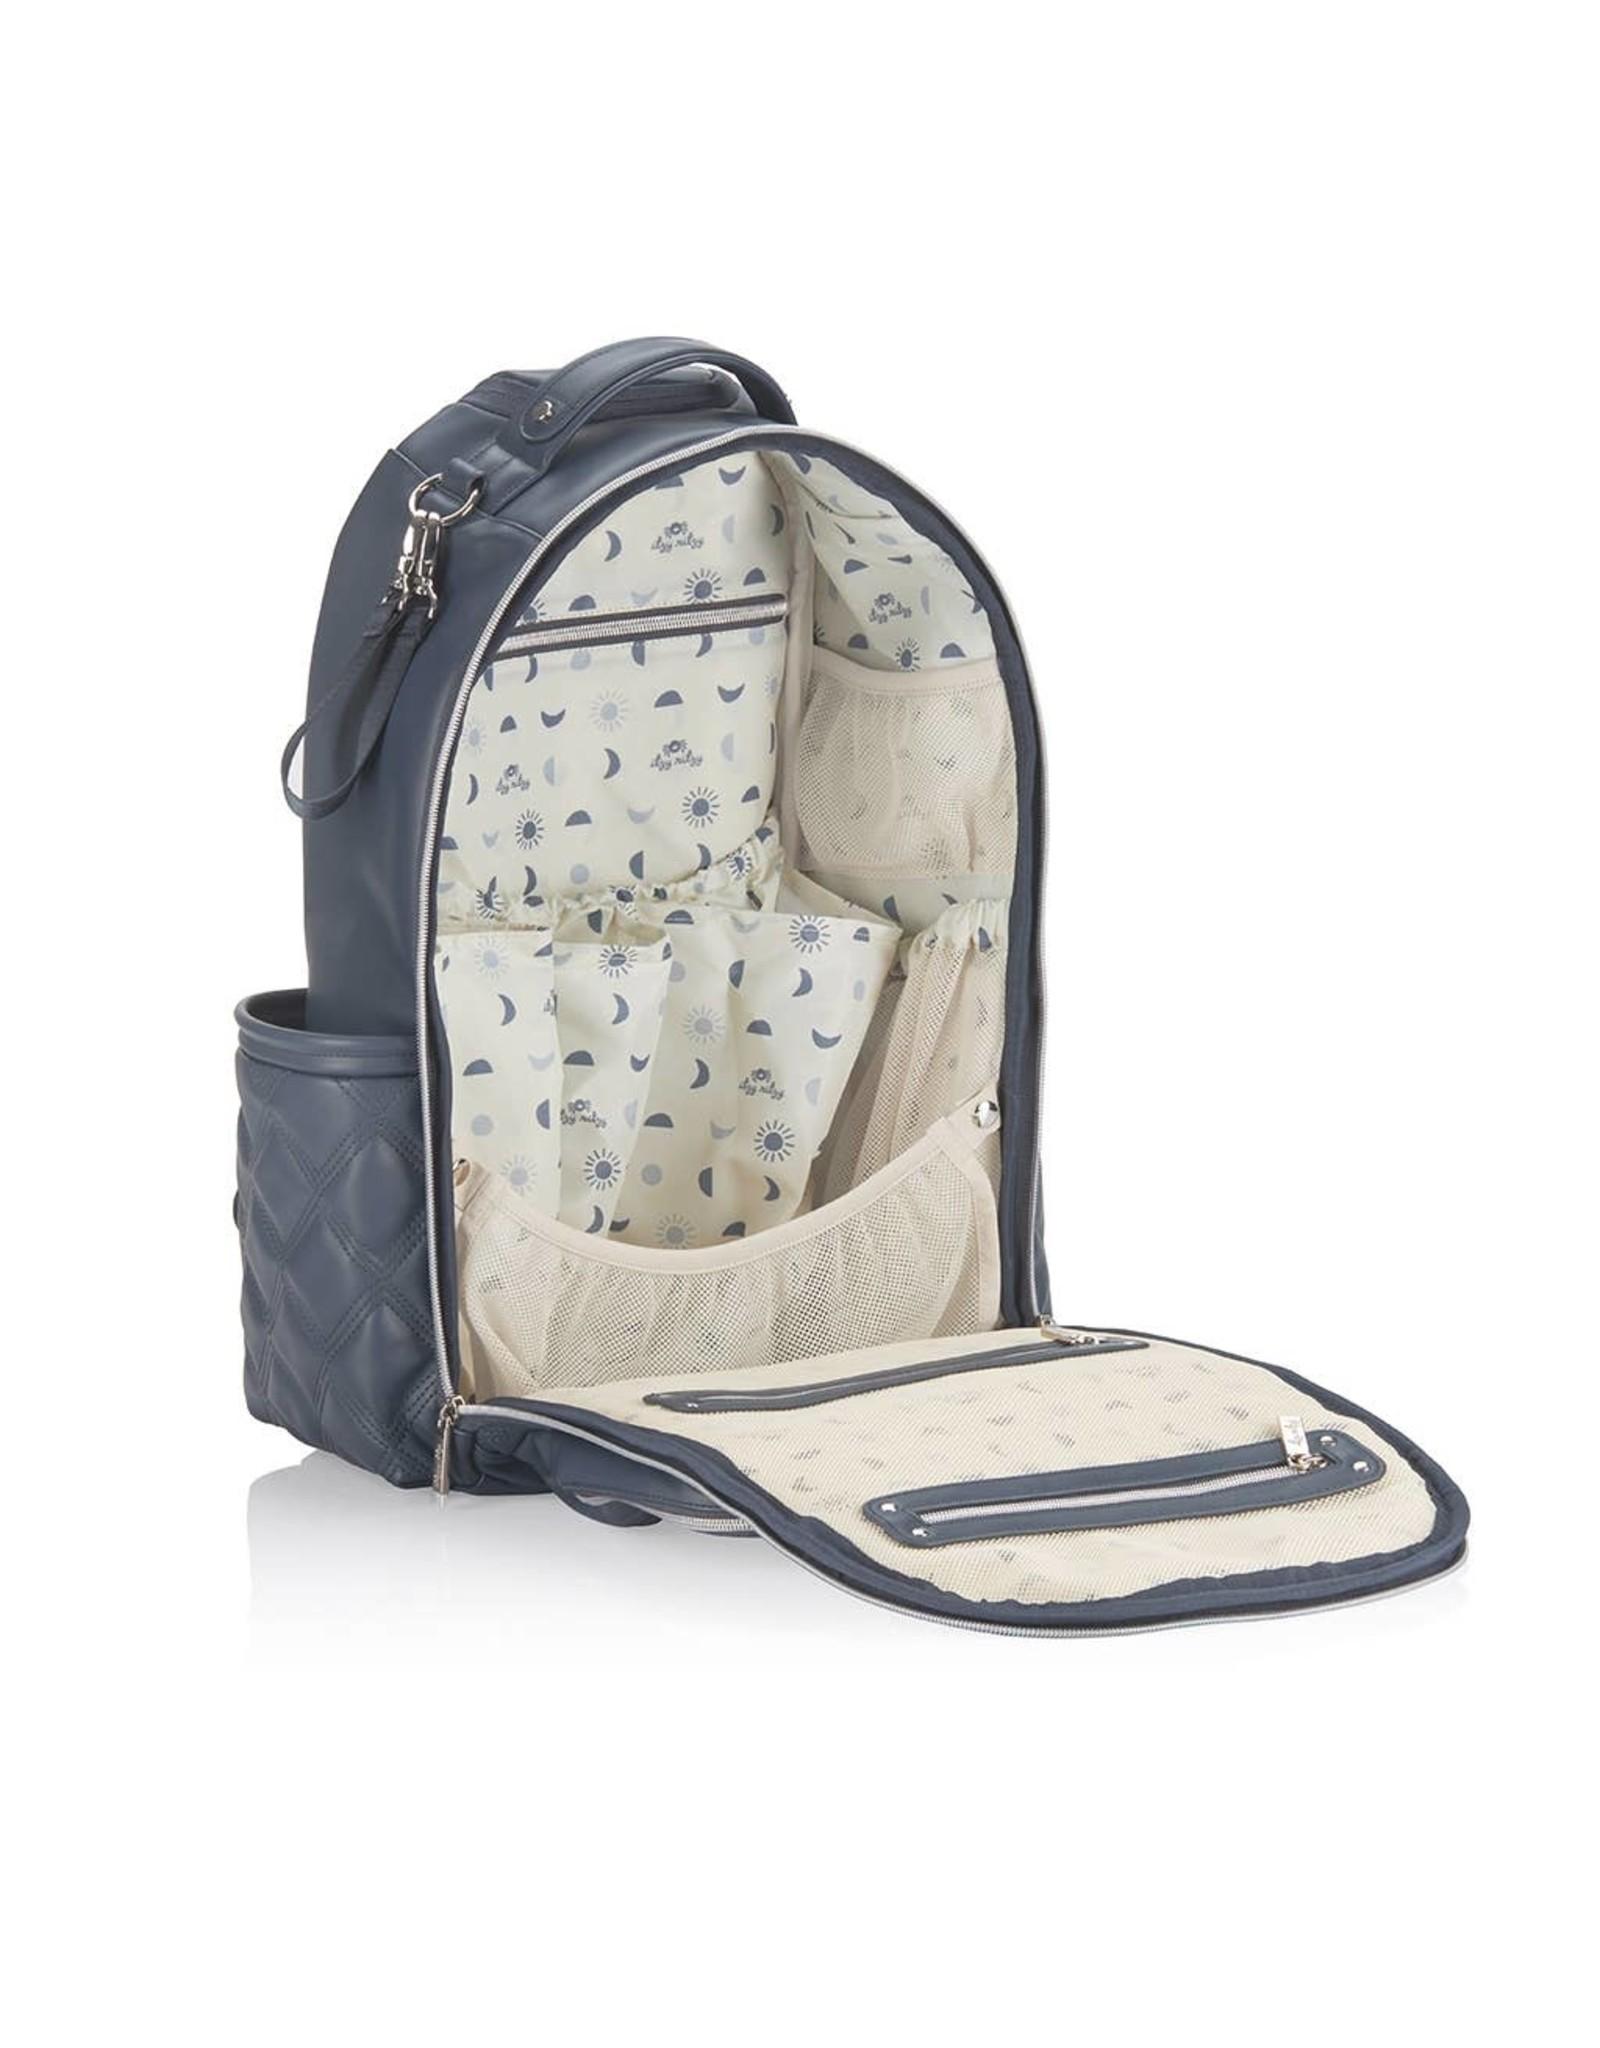 Itzy Ritzy Itzy Ritzy - The Moonstone Boss Plus Backpack Diaper Bag